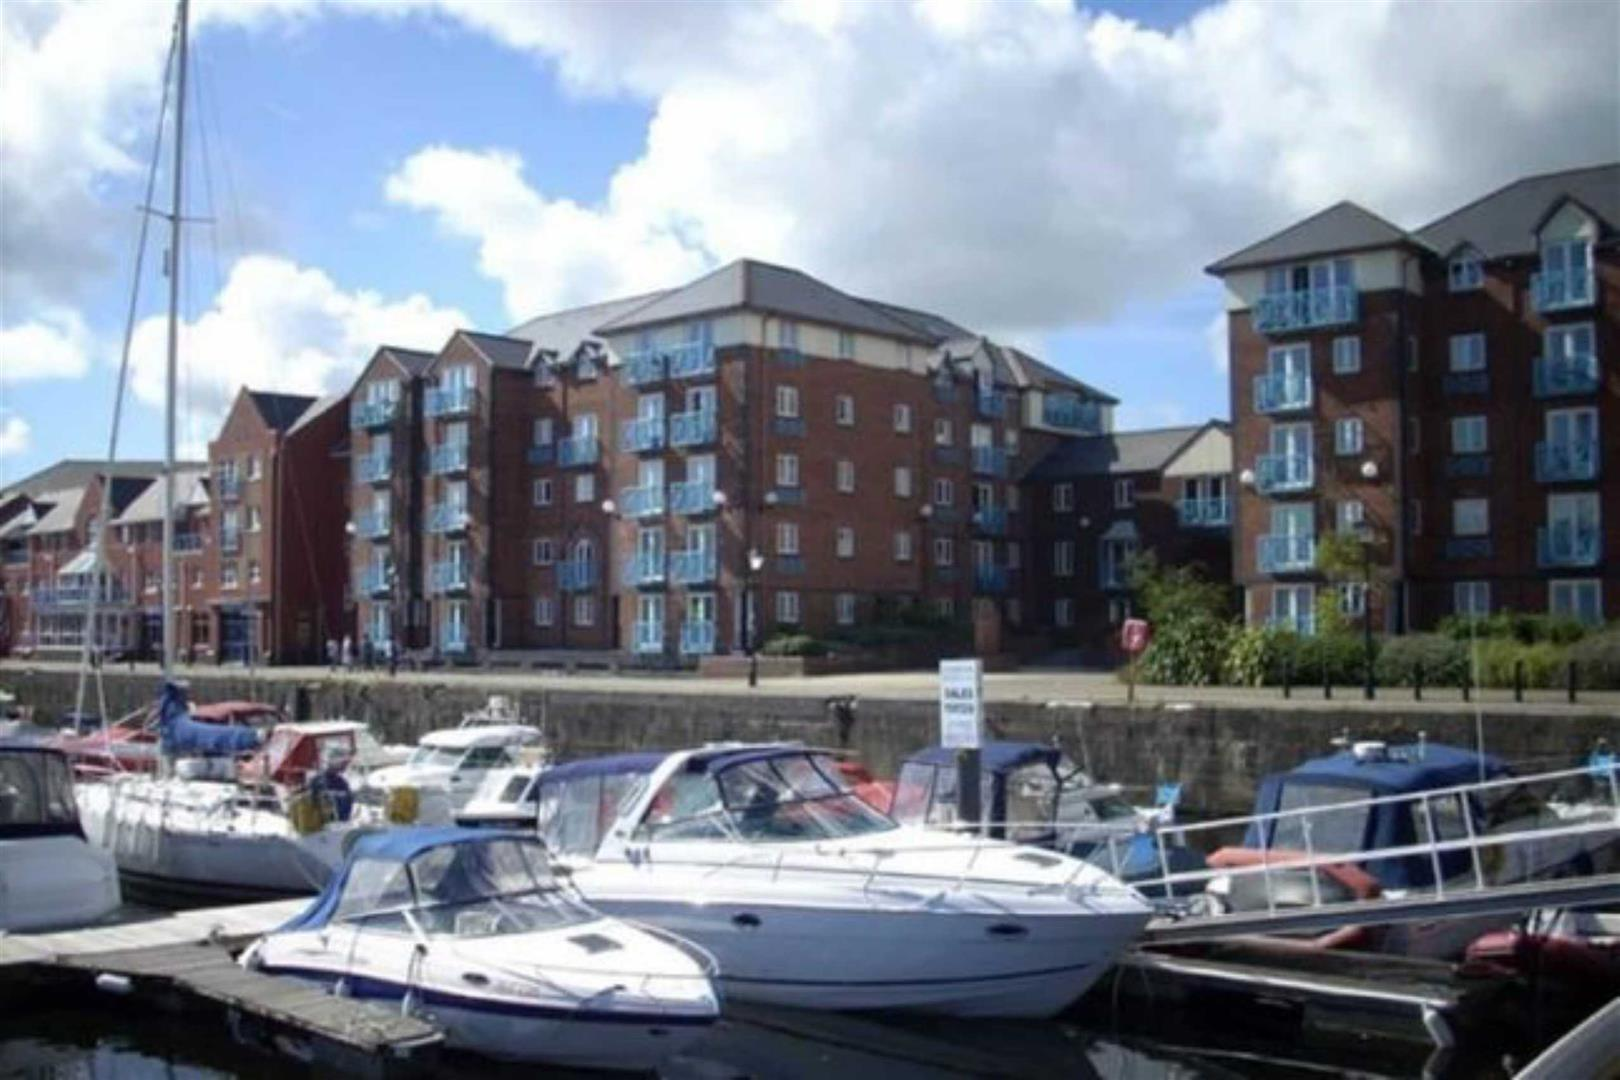 Weavers House Maritime Quarter, Marina, Swansea, SA1 1RU